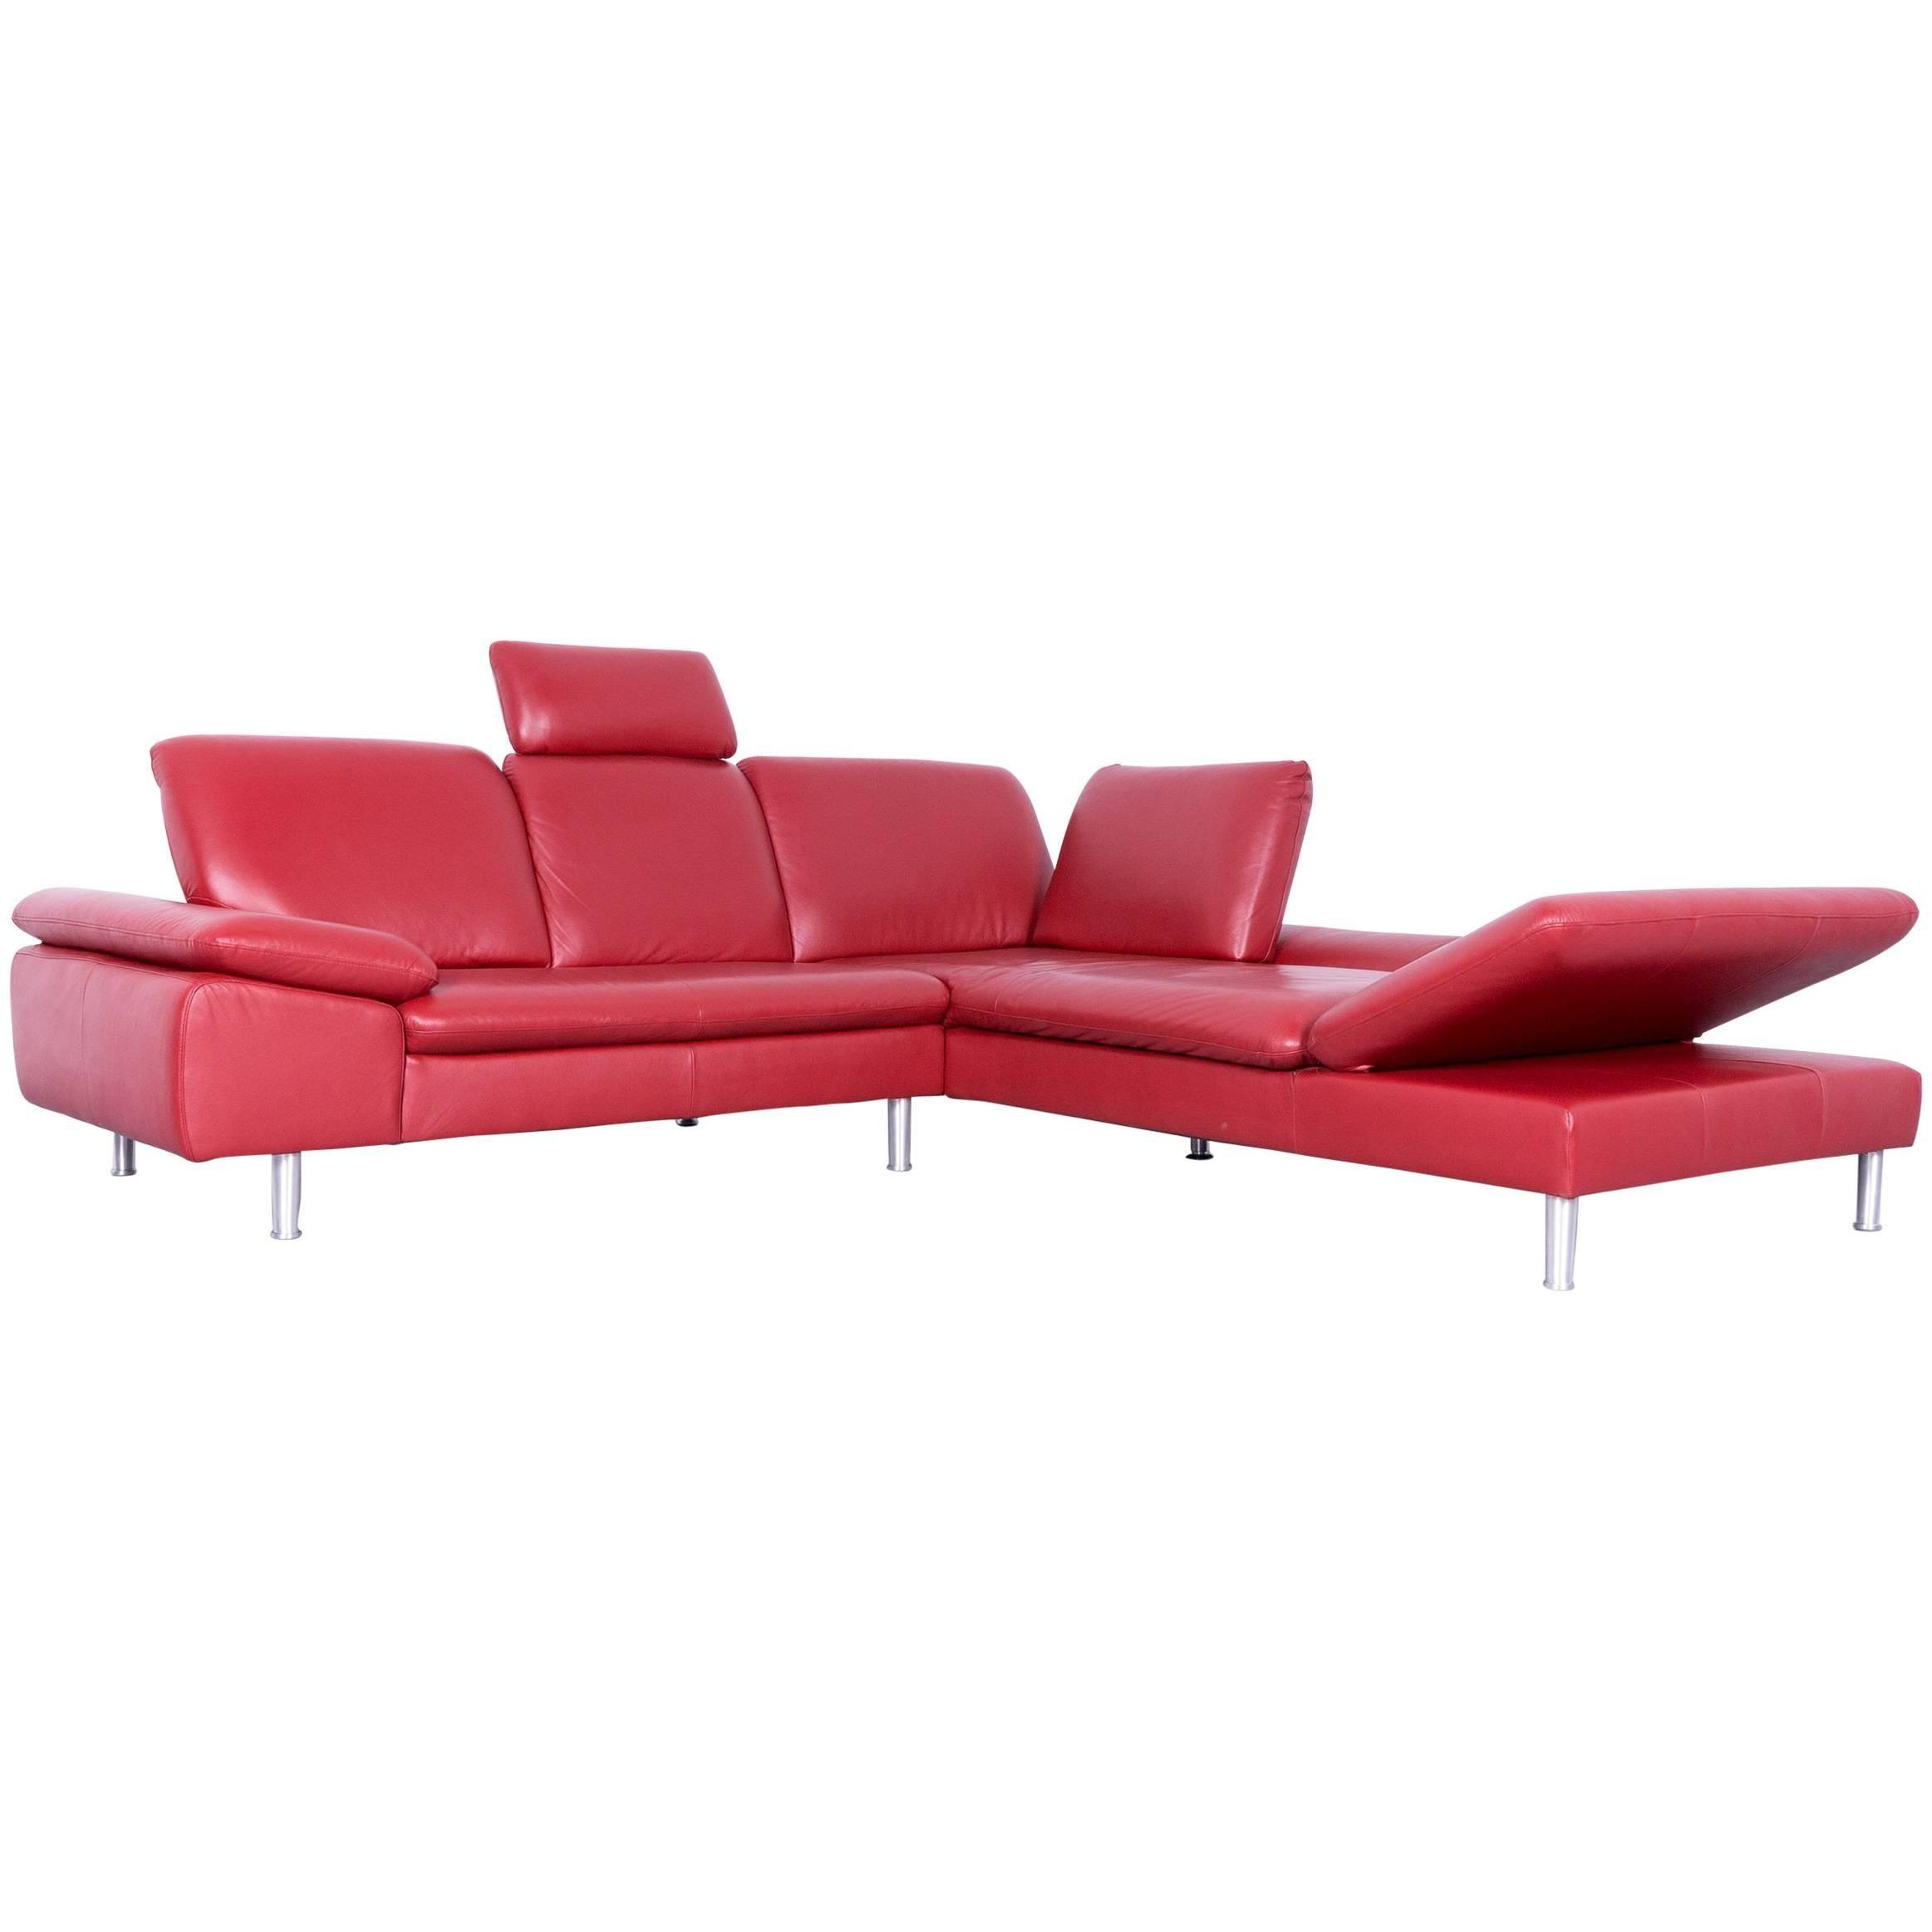 willi schillig sofa perfect foscaari kollektion black label by wschillig with willi schillig. Black Bedroom Furniture Sets. Home Design Ideas